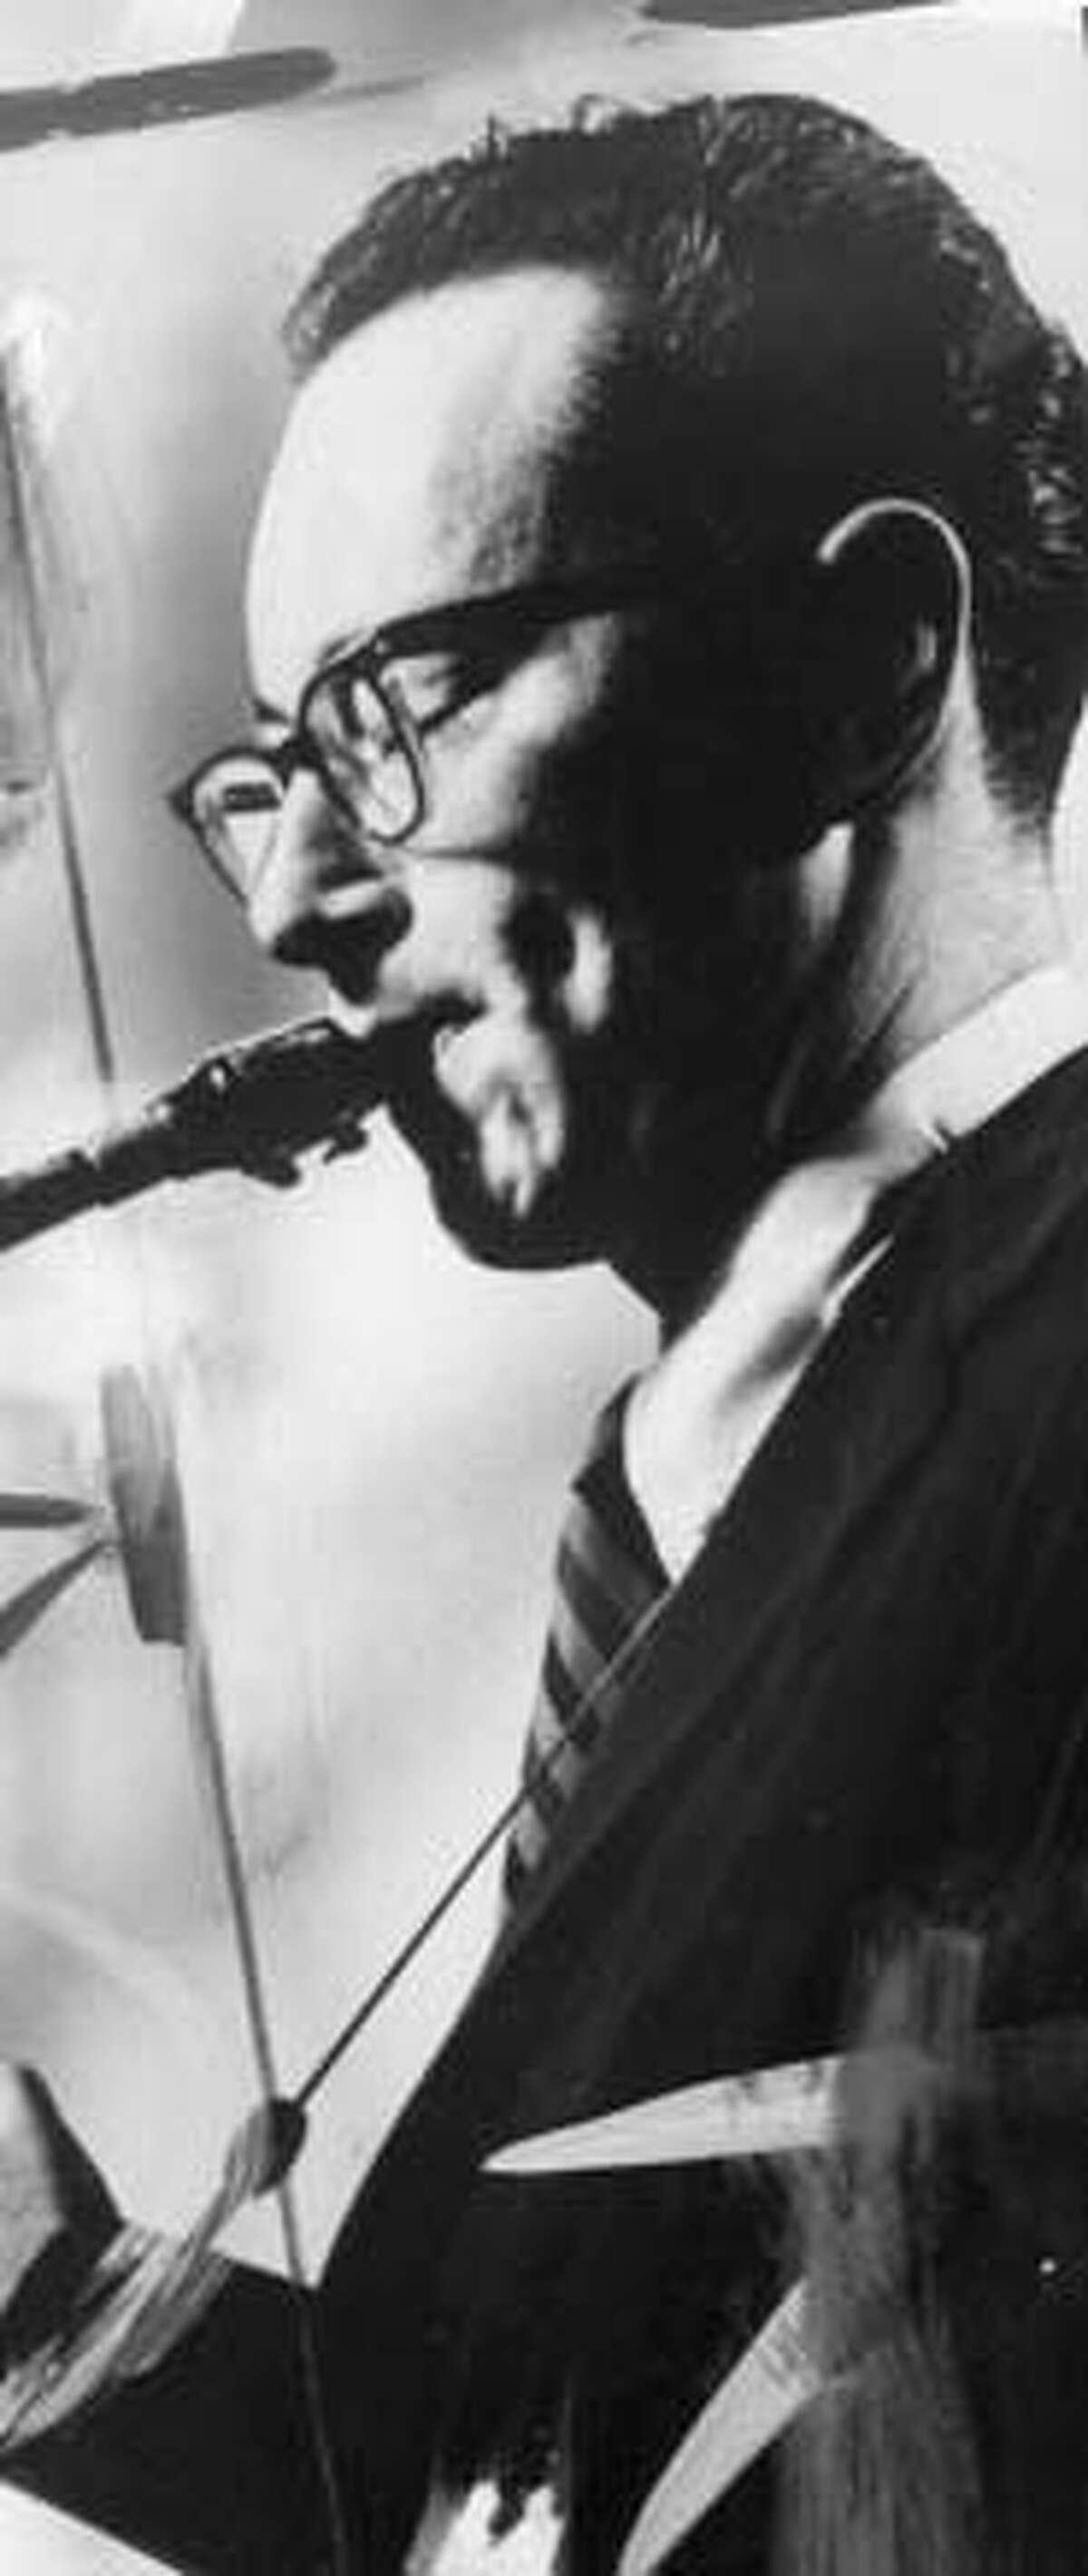 Jazz saxophonist Paul Desmond, photograph from 1964